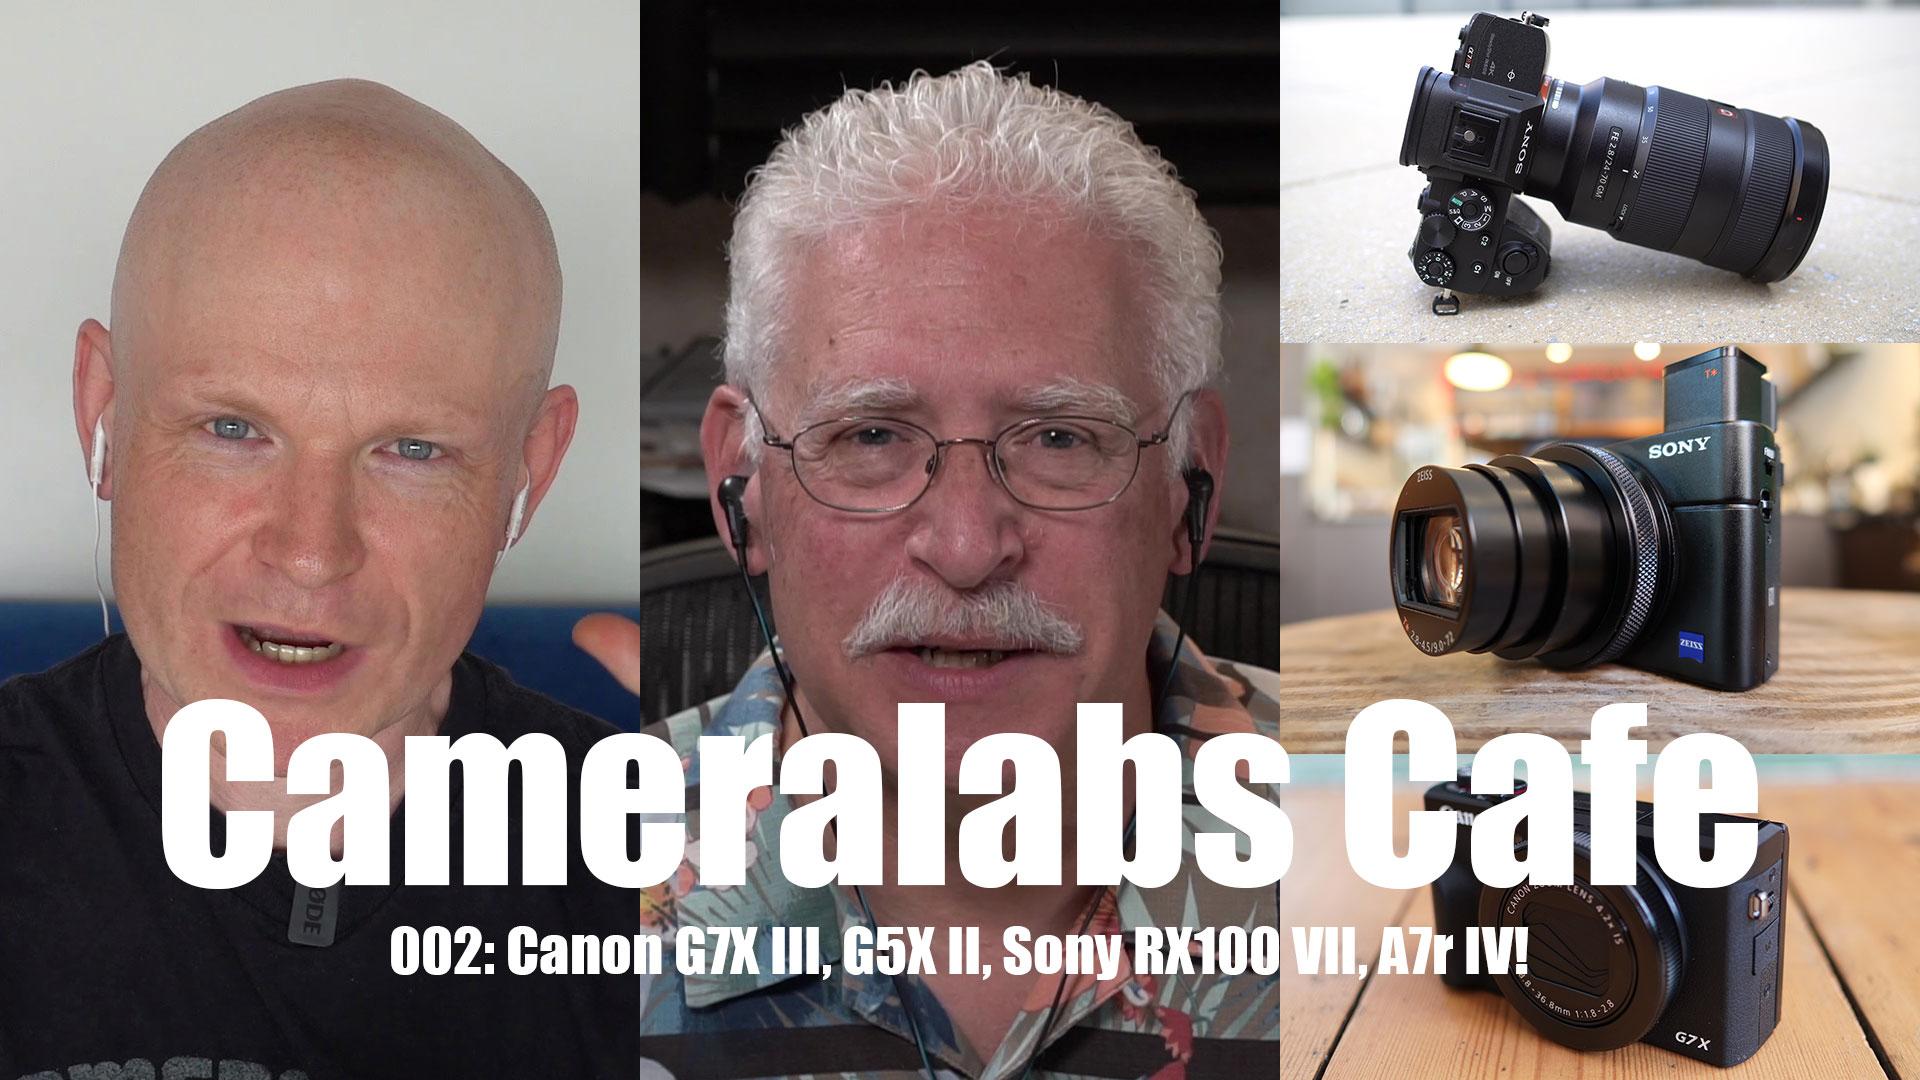 cameralabs-cafe-ep-2-header